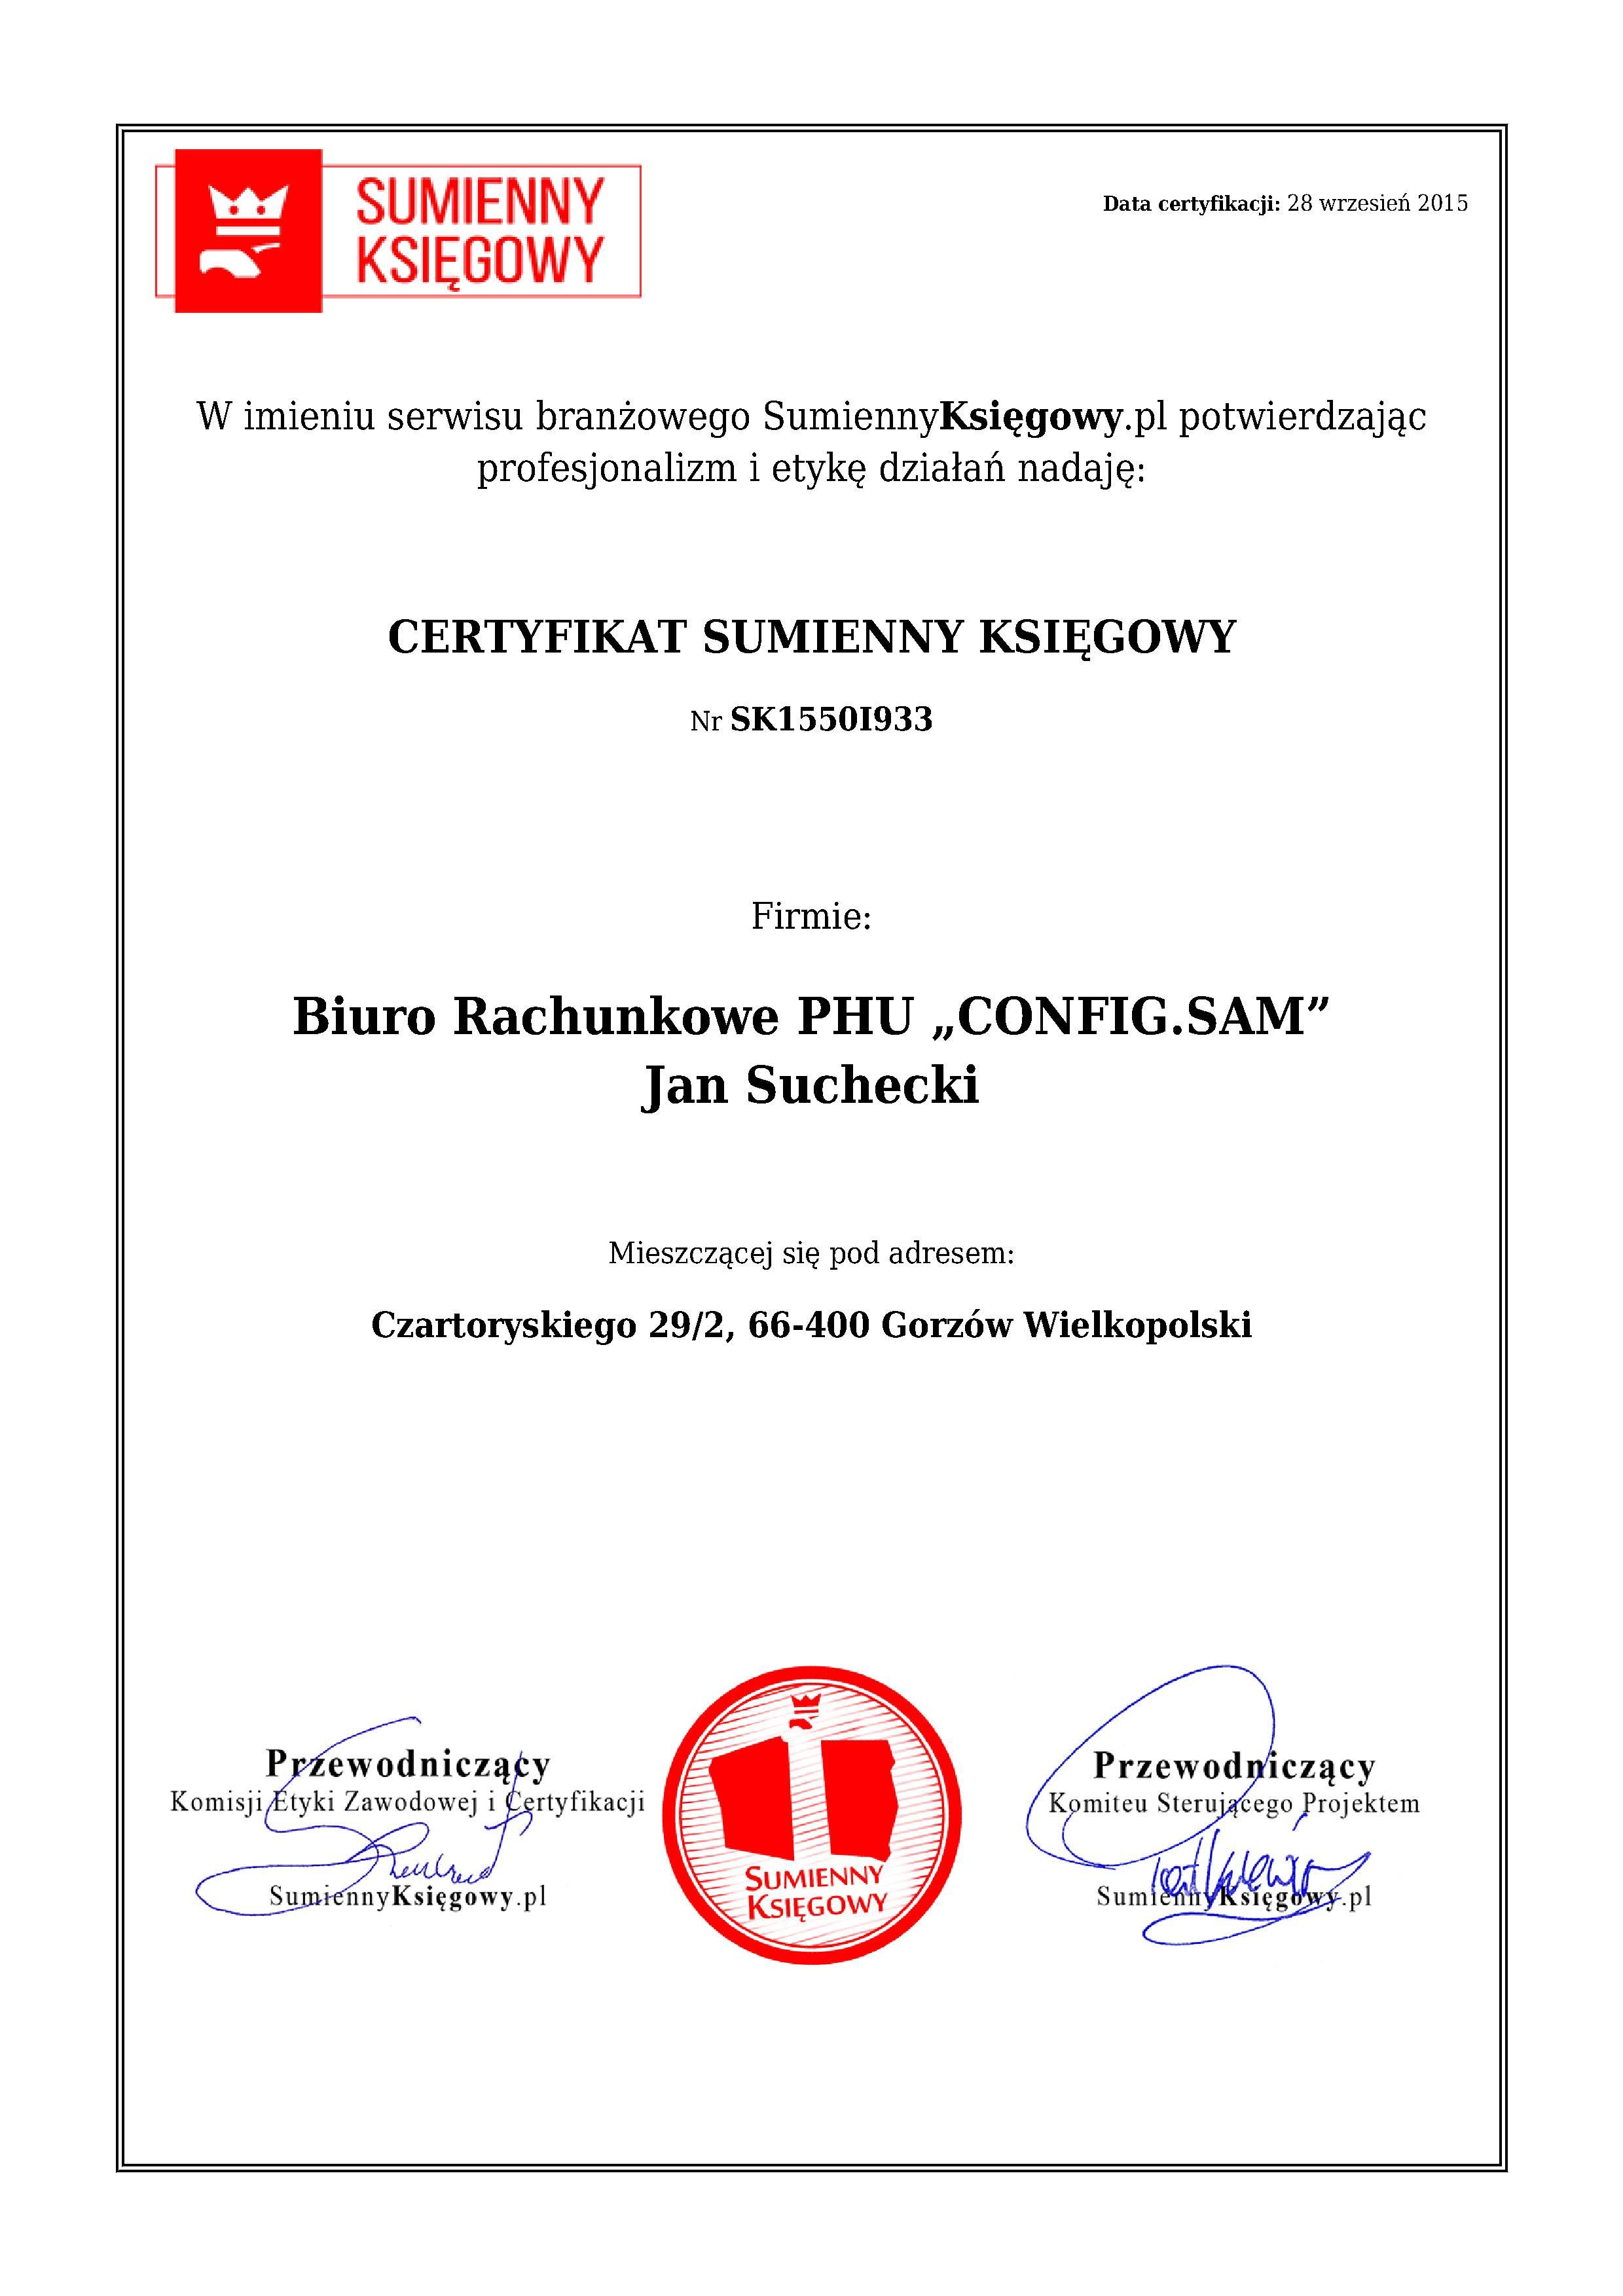 "Certyfikat Biuro Rachunkowe PHU ""CONFIG.SAM"" Jan Suchecki"